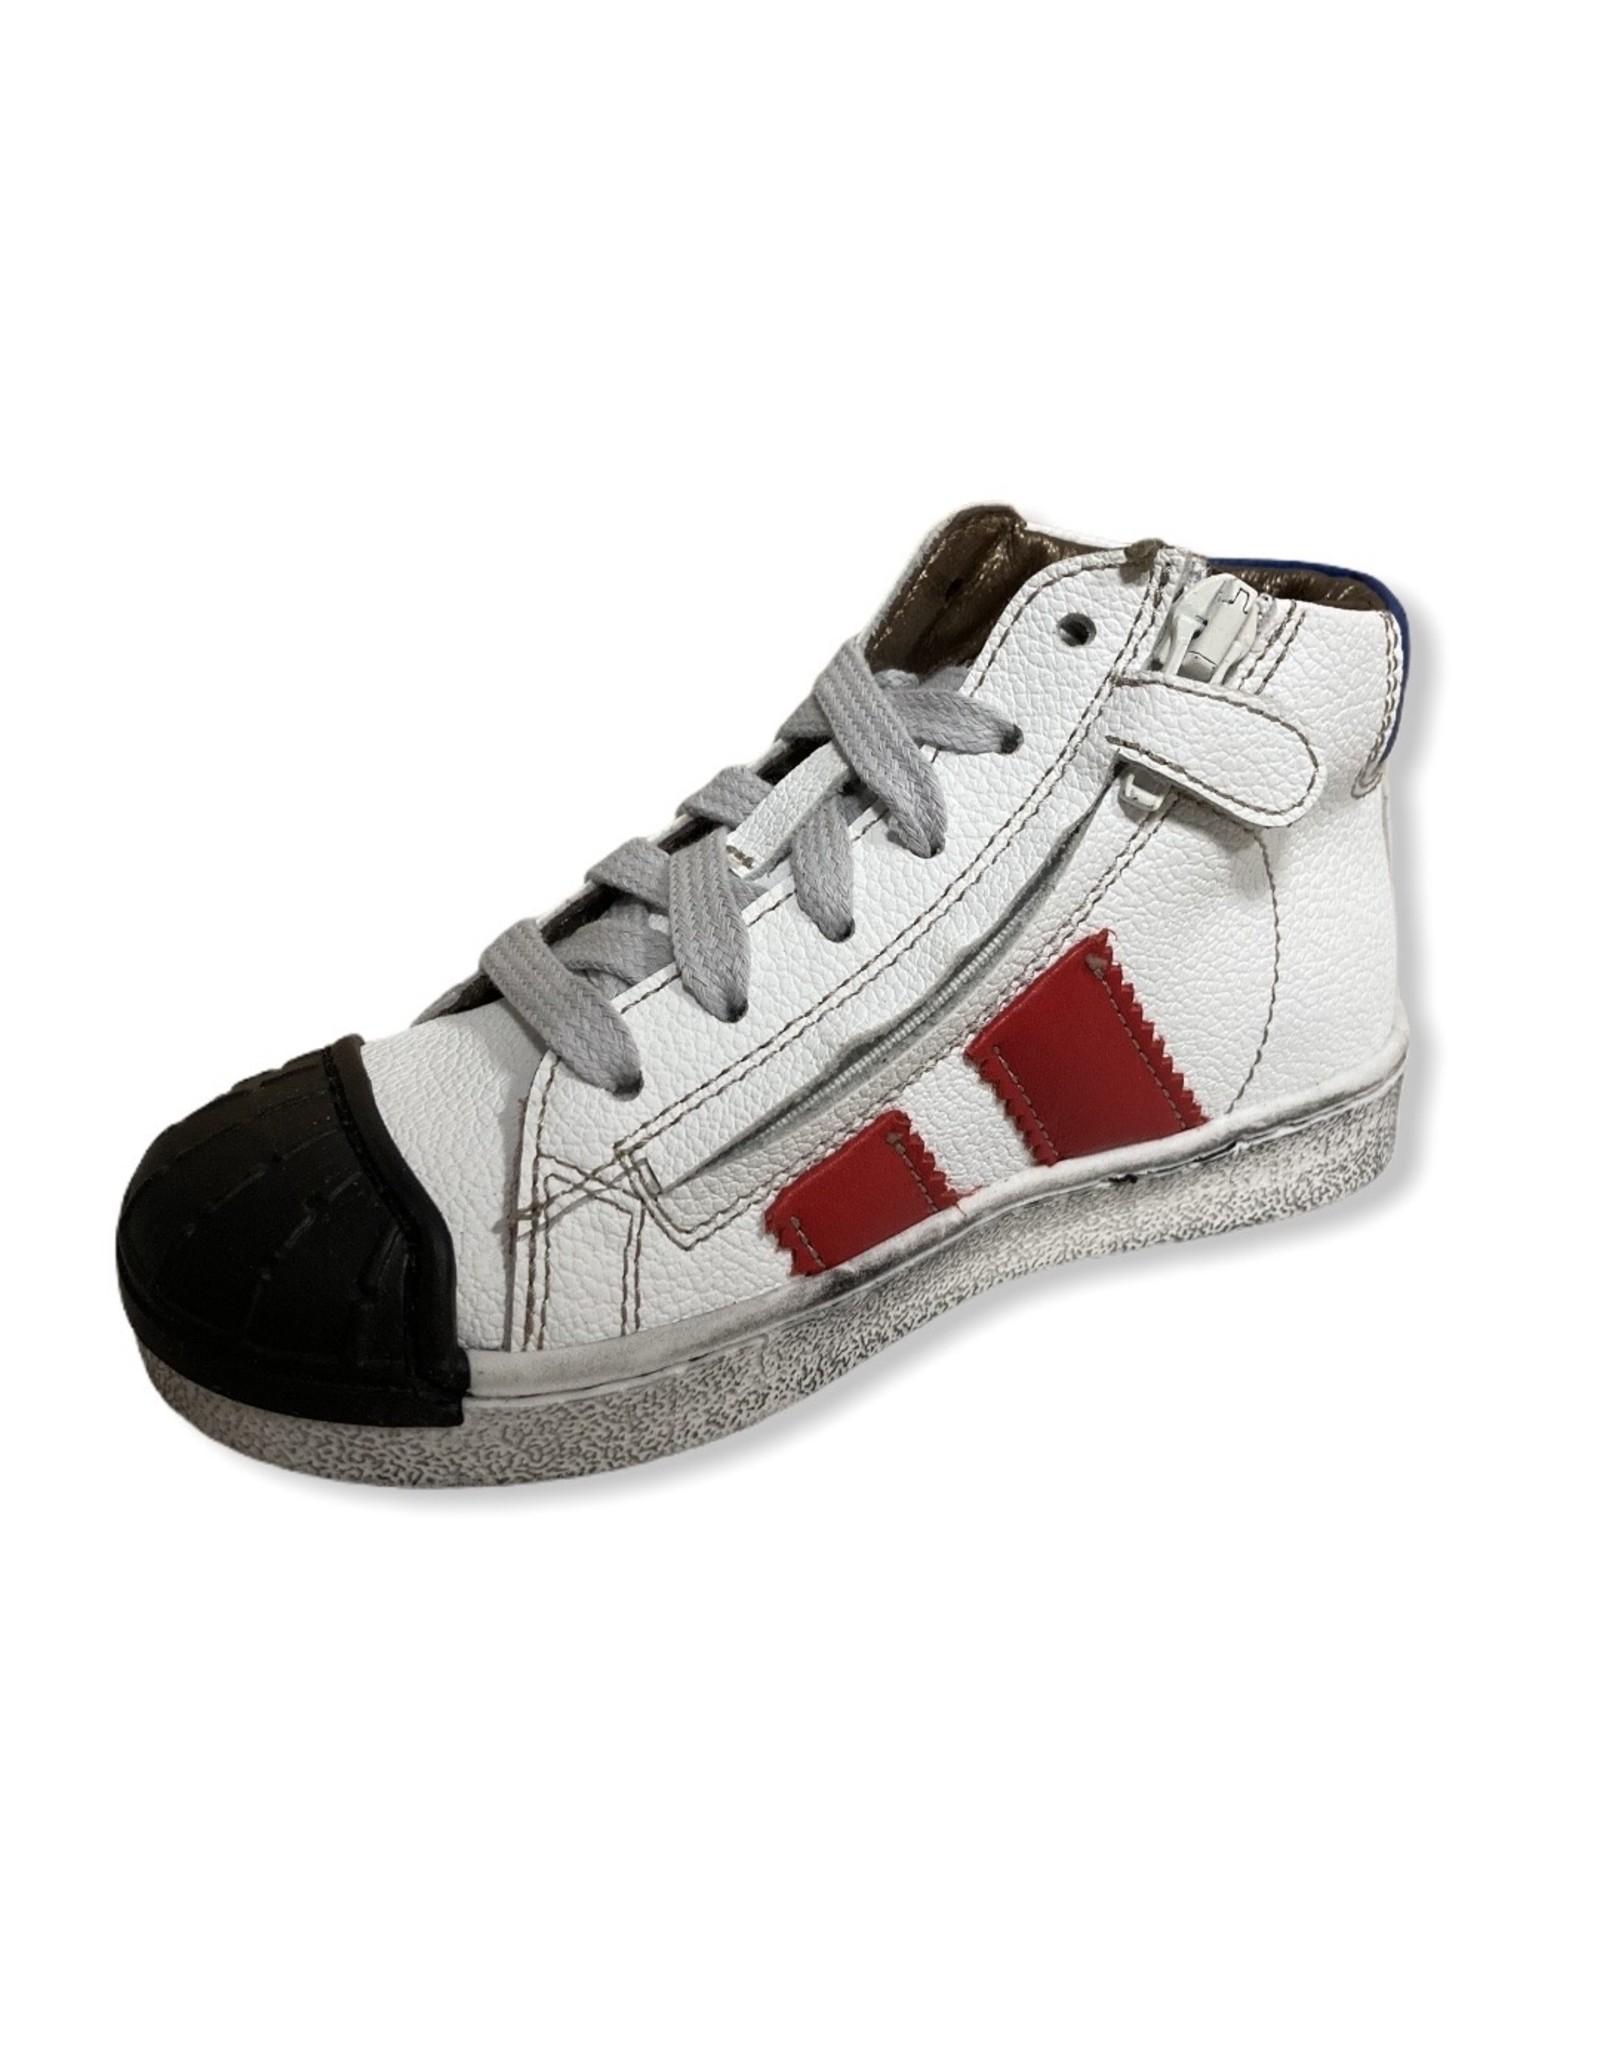 Momino Momino FW20 witte sneaker zwarte tip